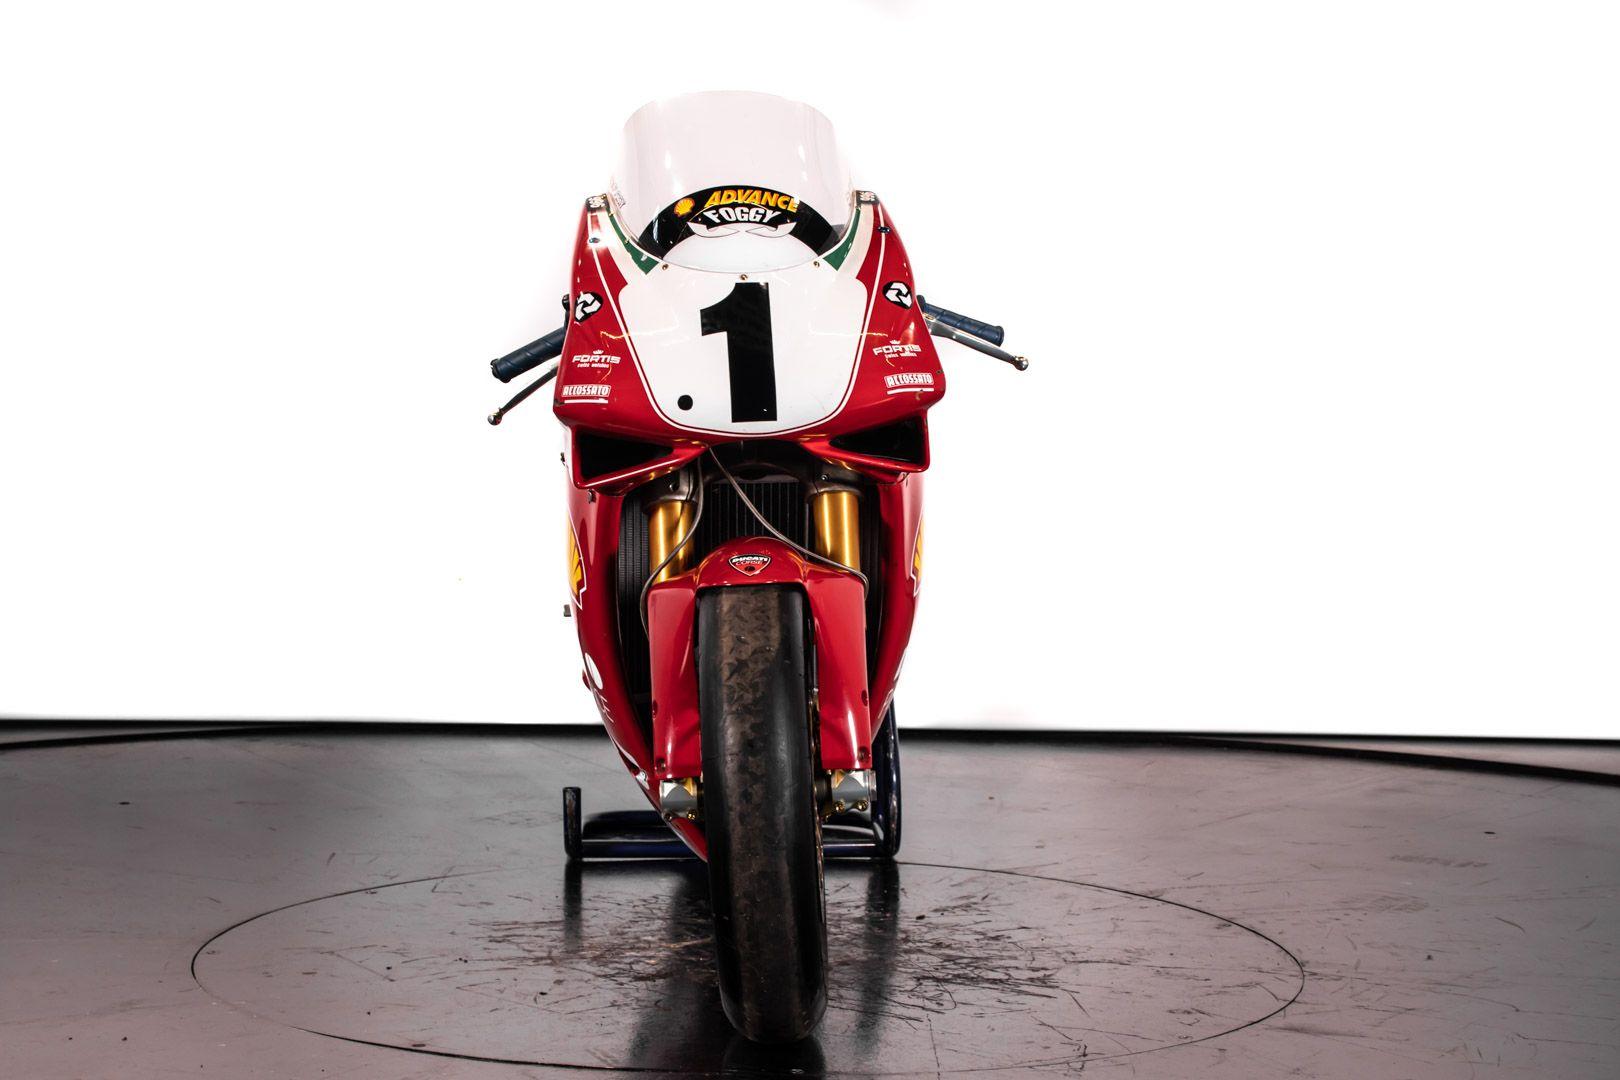 2008 Ducati 996 Fogarty Evocation 03/12 84207